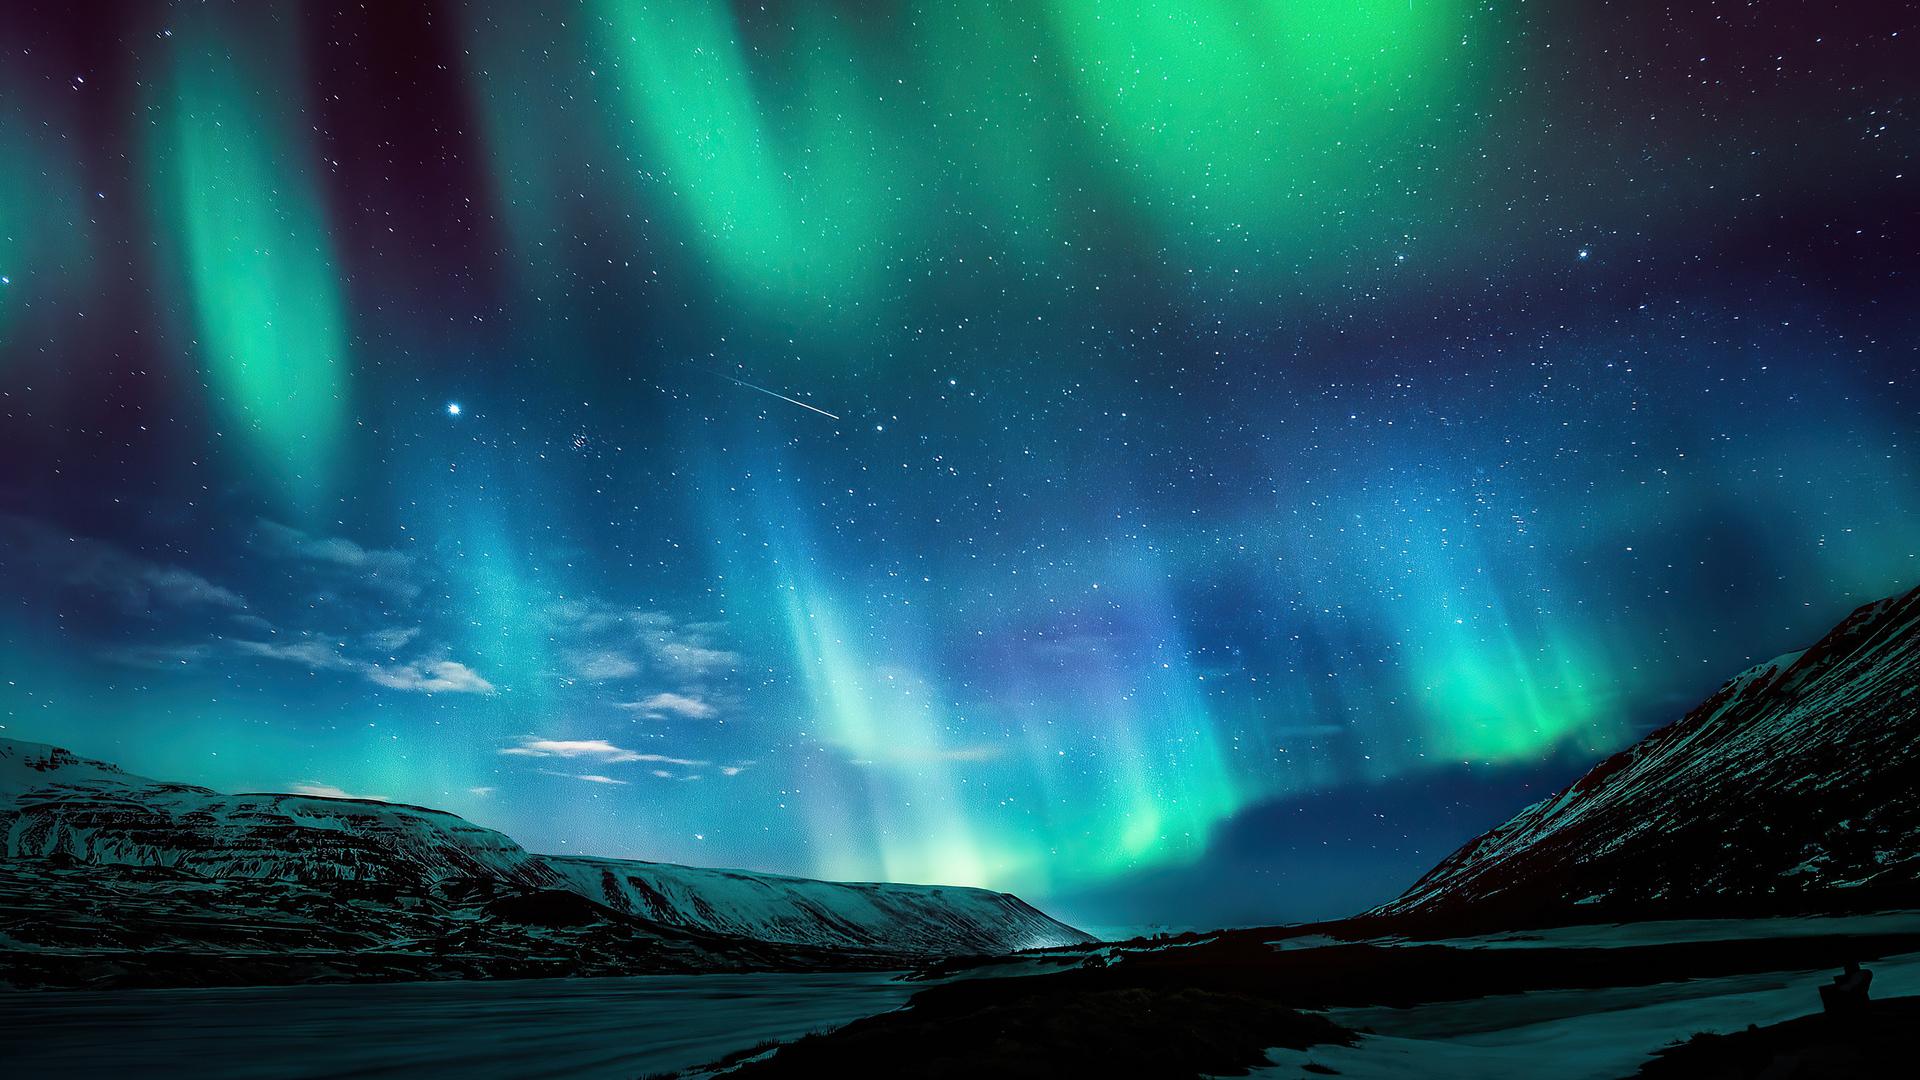 aurora-borealis-northern-lights-4k-kr.jpg